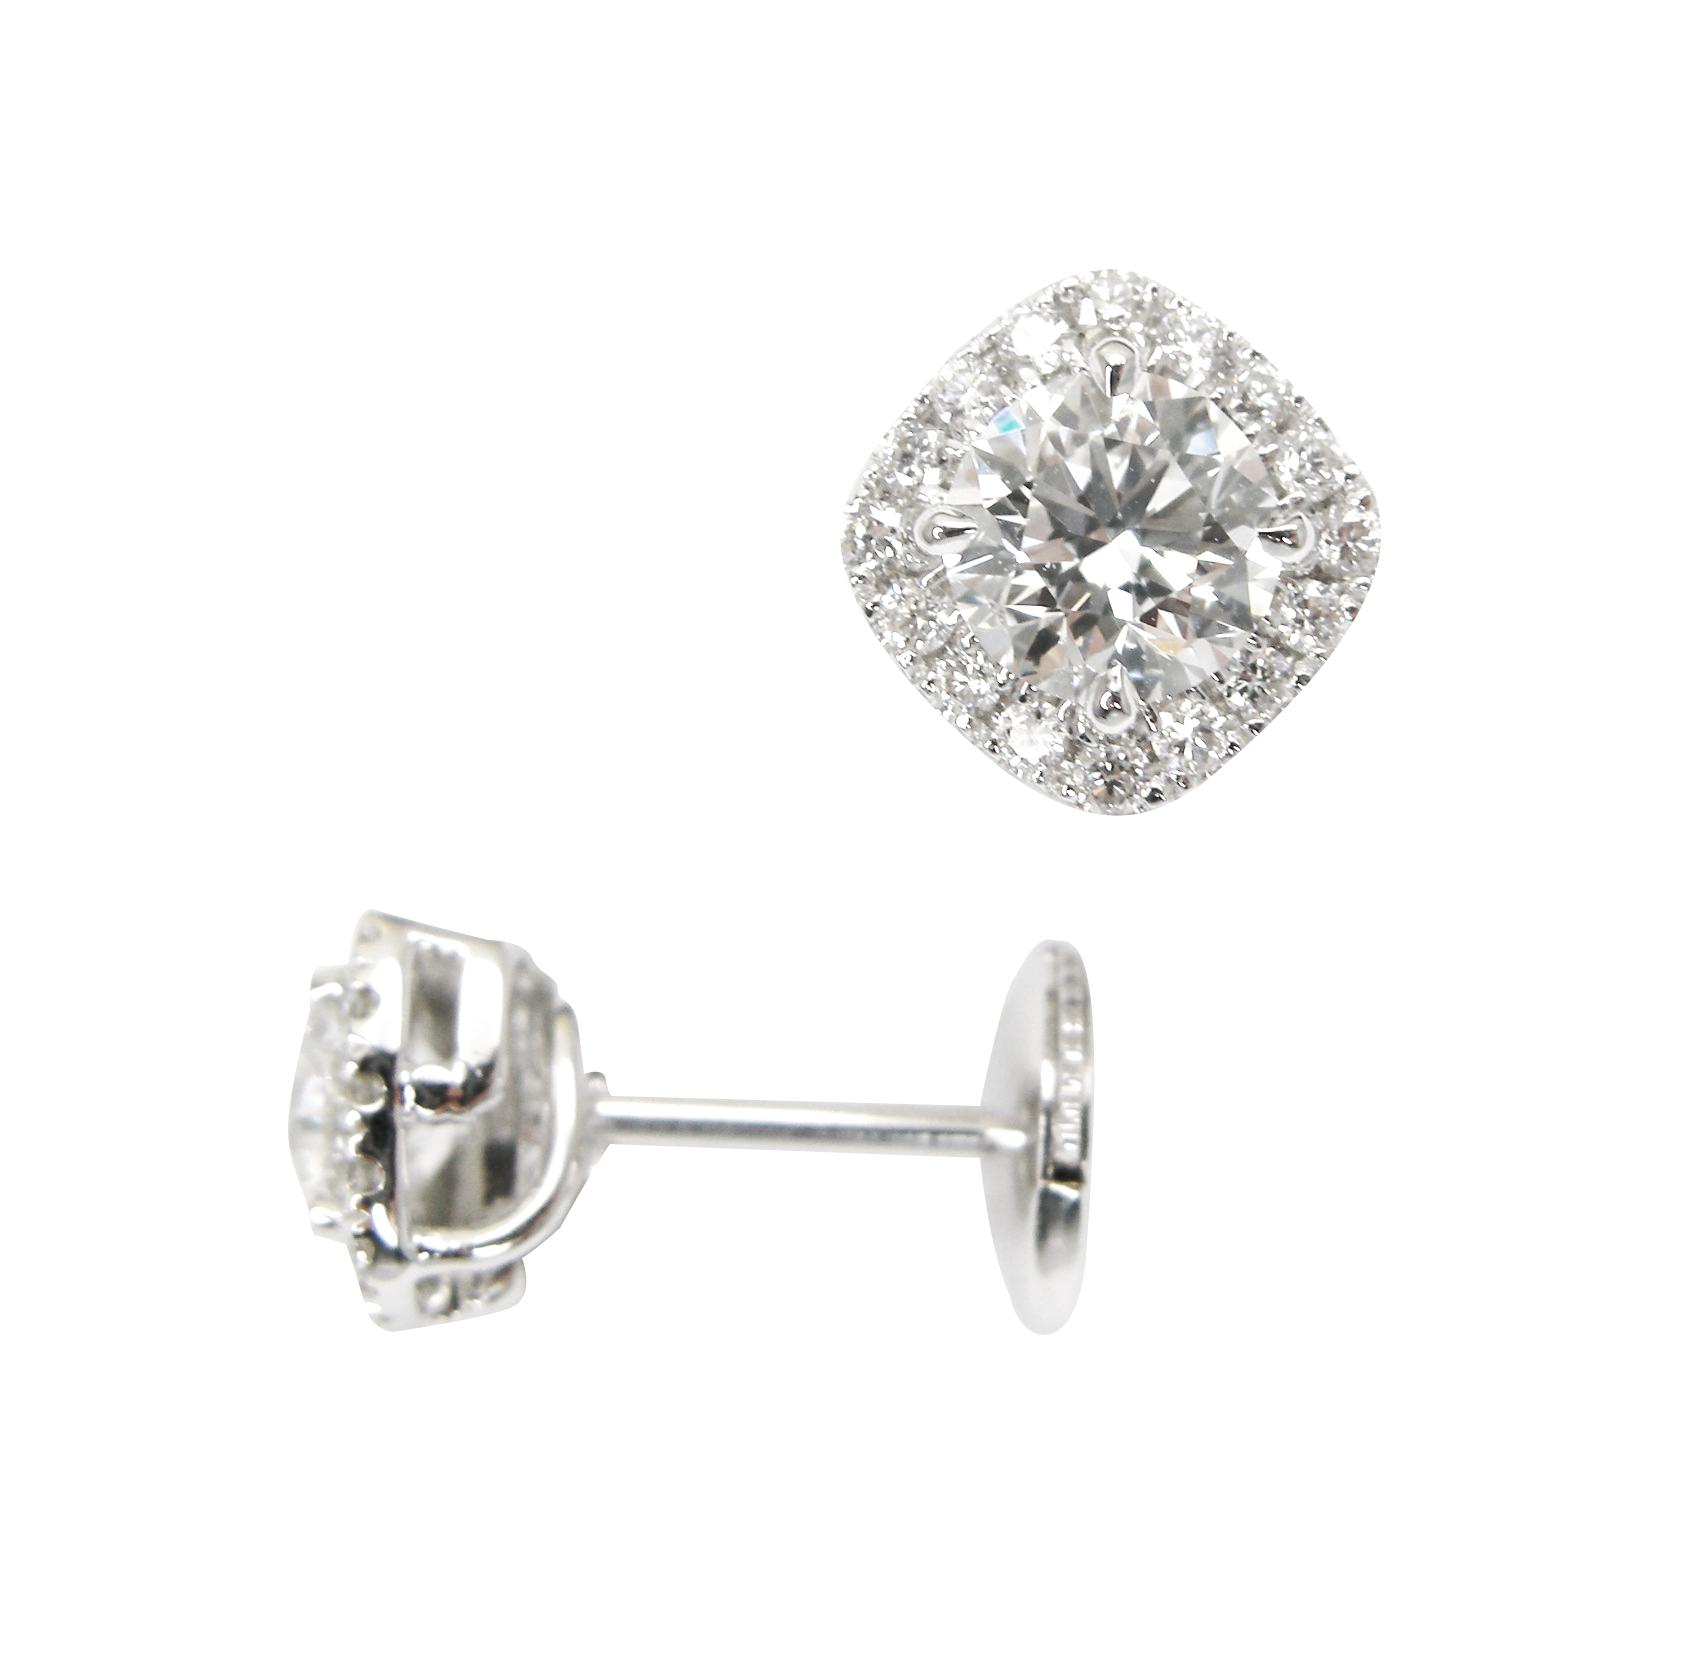 ROUND DIAMOND CUSHION HALO STUD EARRINGS BESPOKE FINE JEWELLERY BY SHAHINA HATTA